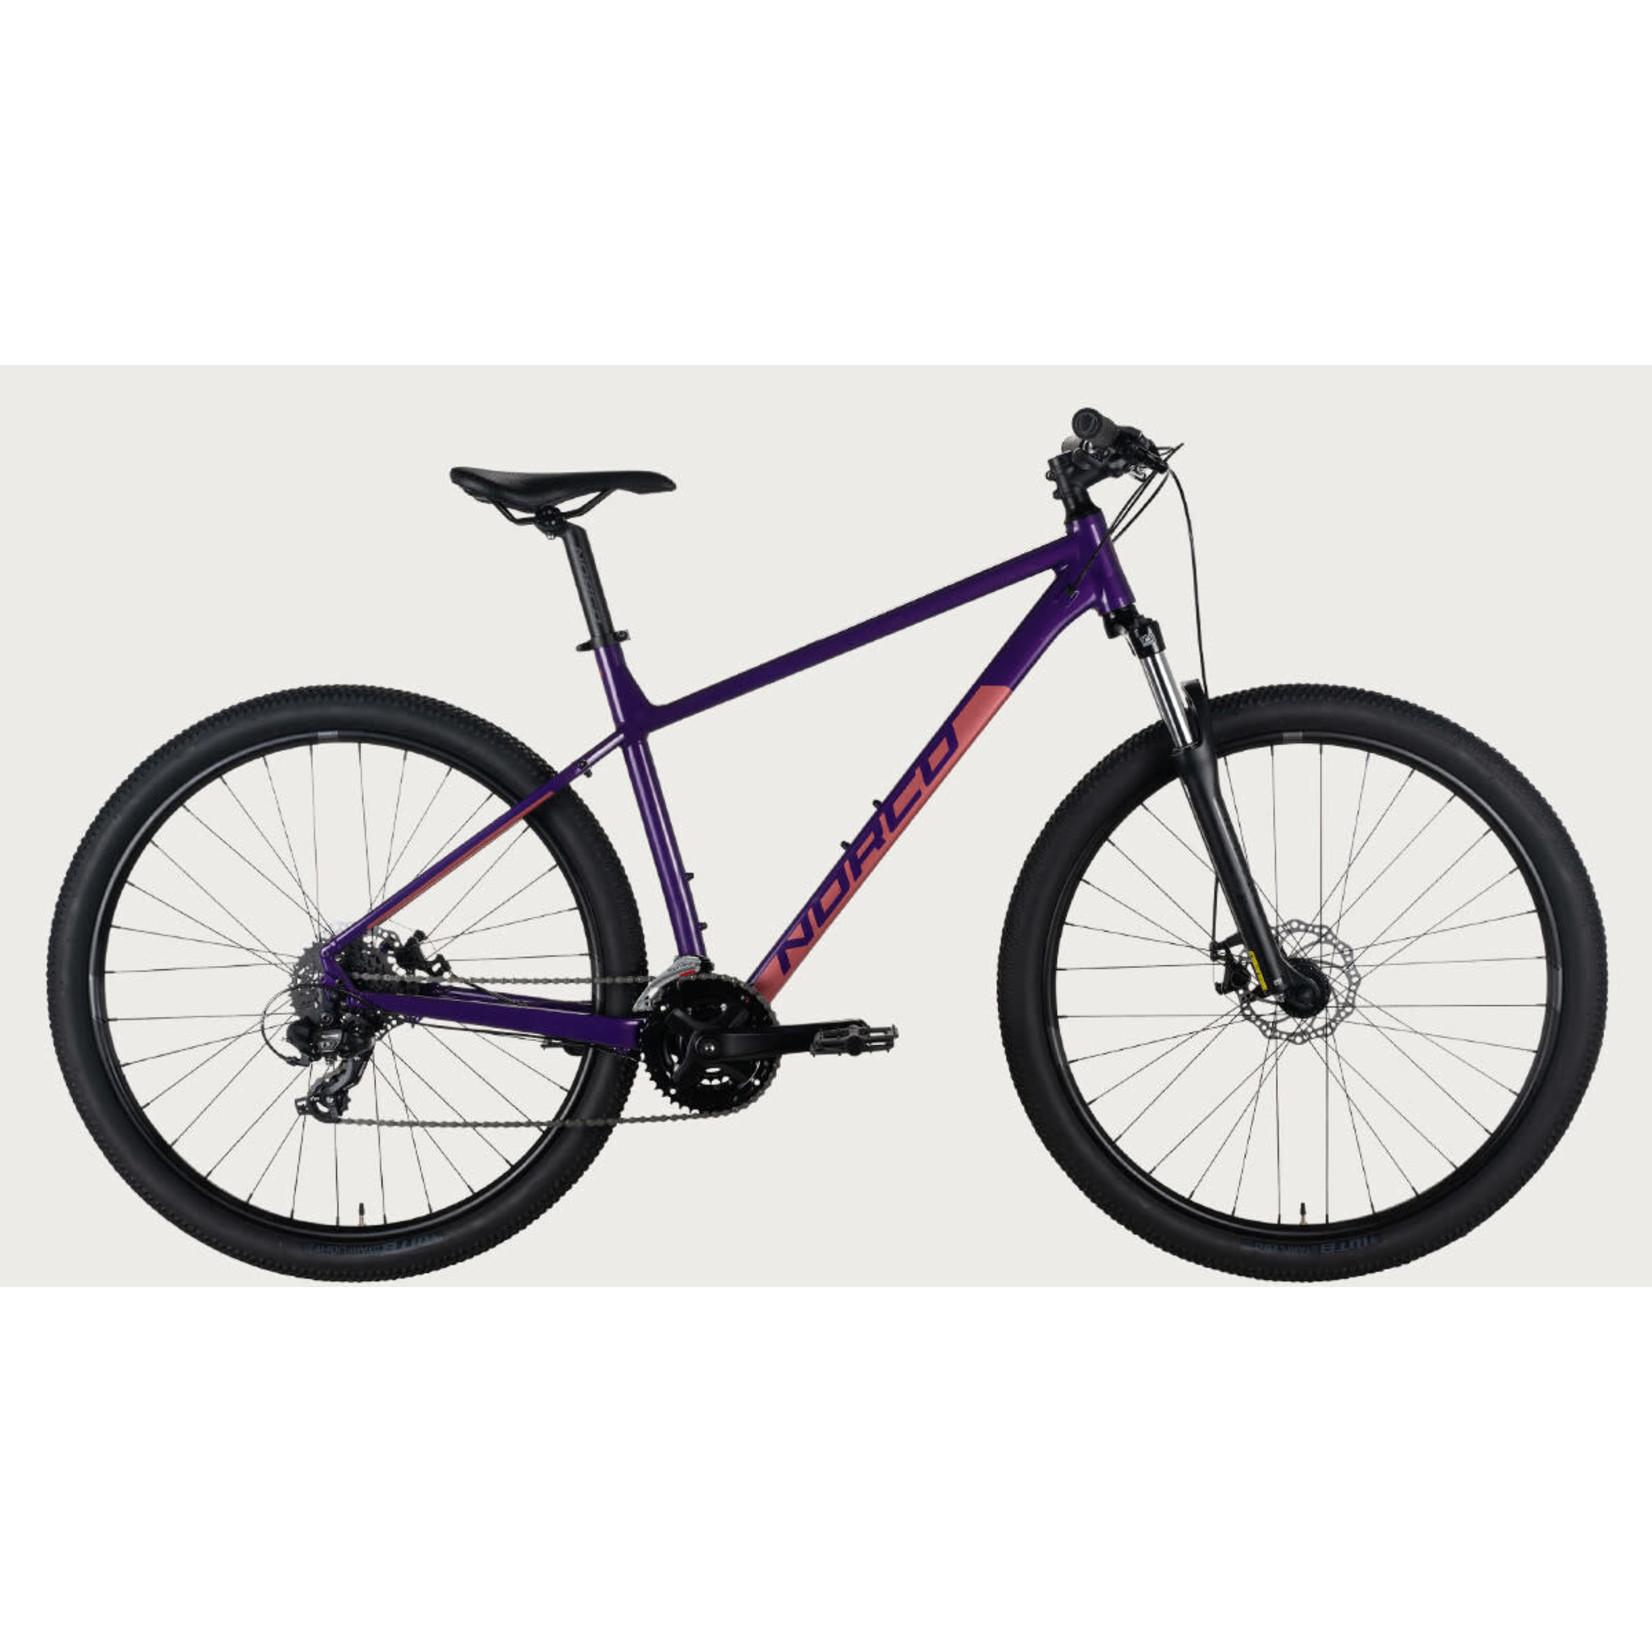 Norco Bike Norco Storm 5 Purple/Pink 29 M